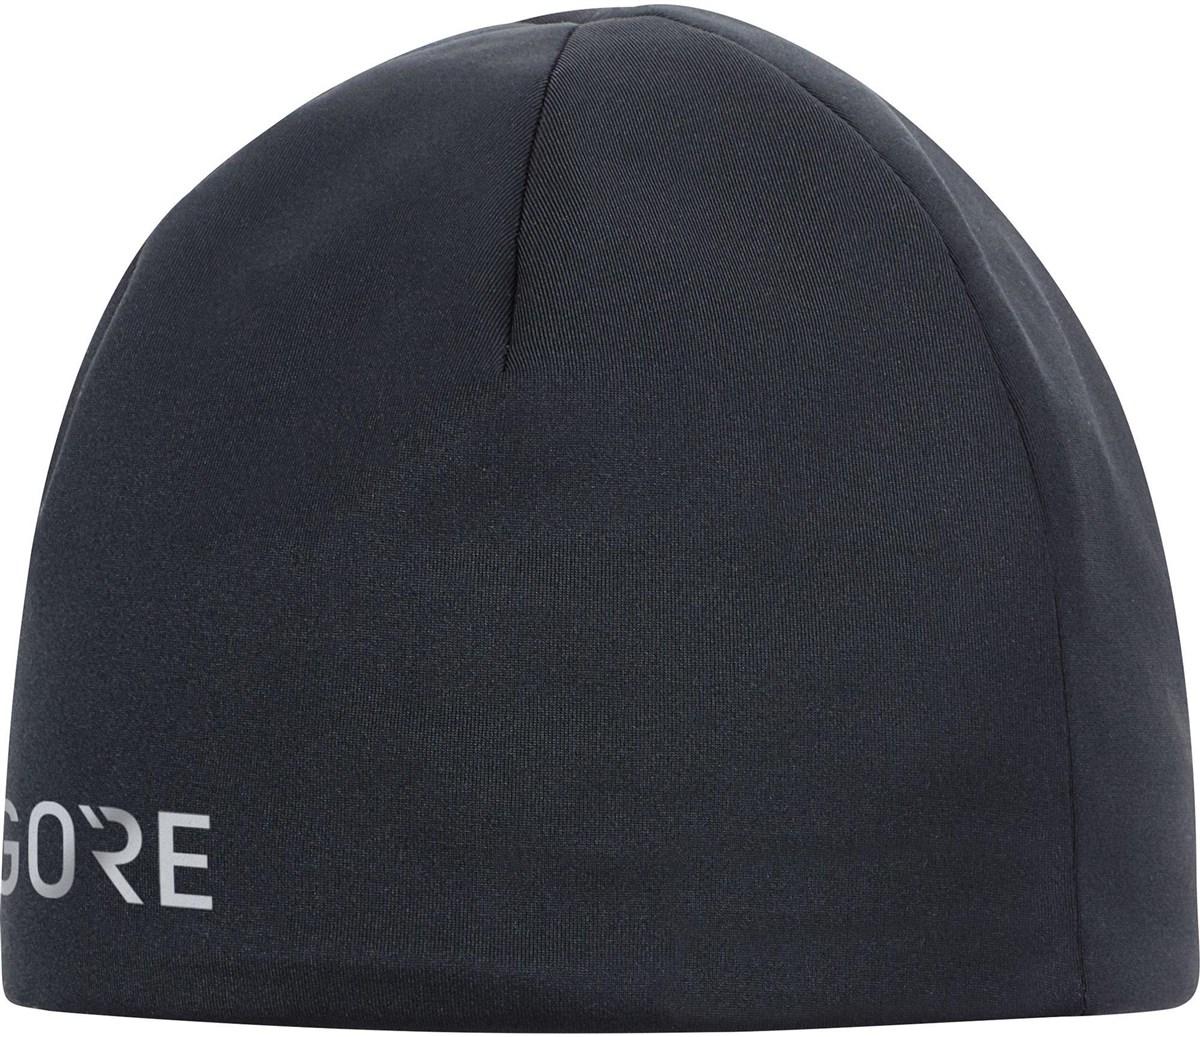 Gore M Windstopper Insulated Beanie   Headwear